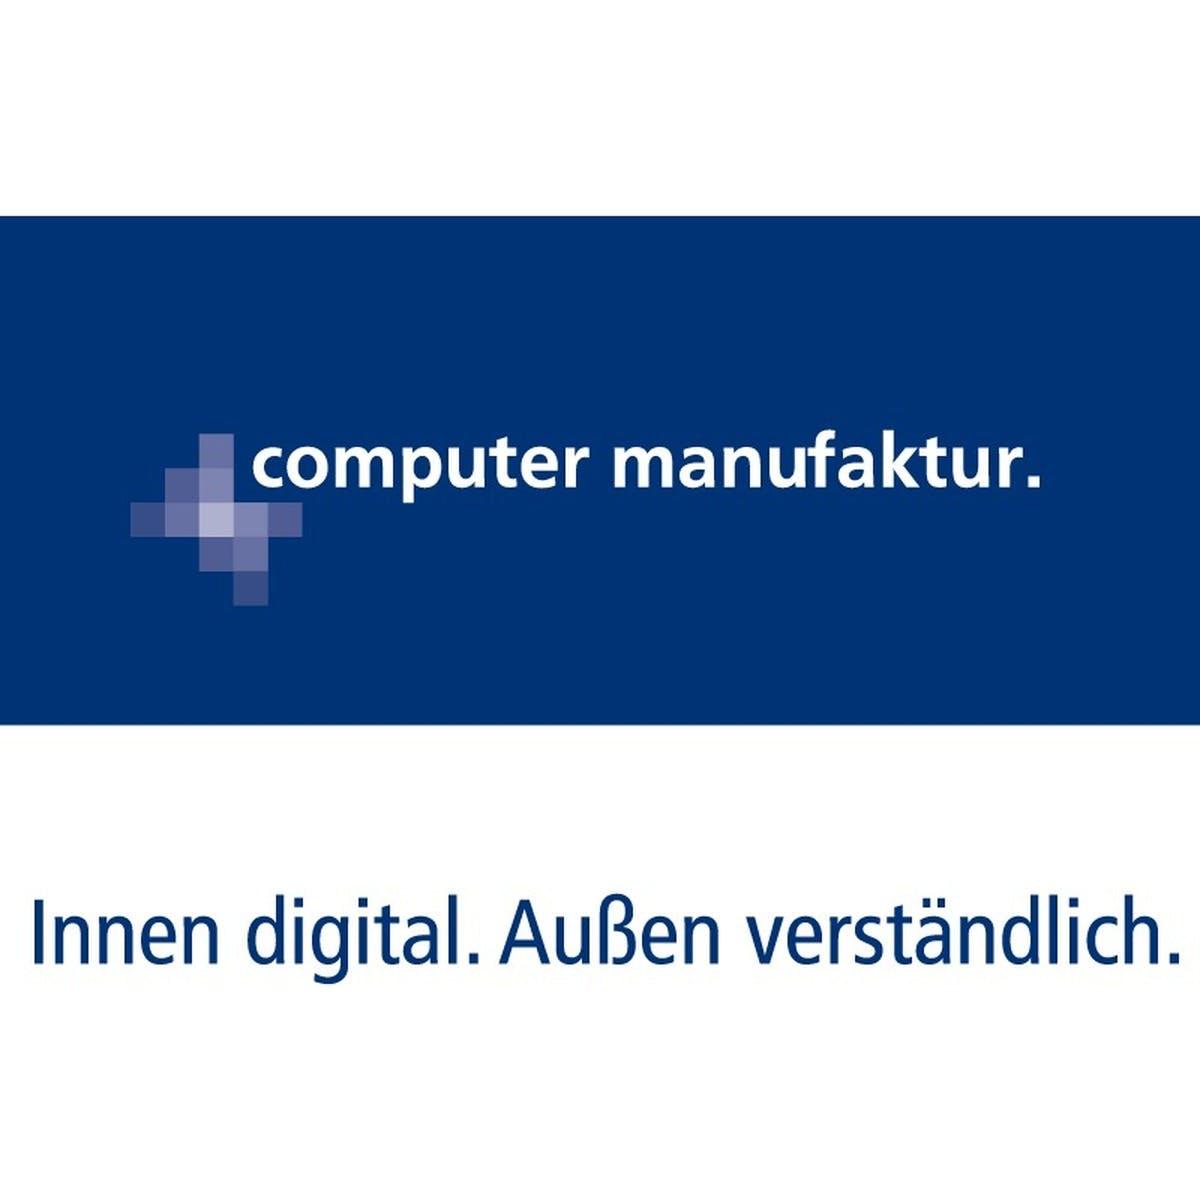 Frontend-Entwickler, Webentwickler (m/w/d)